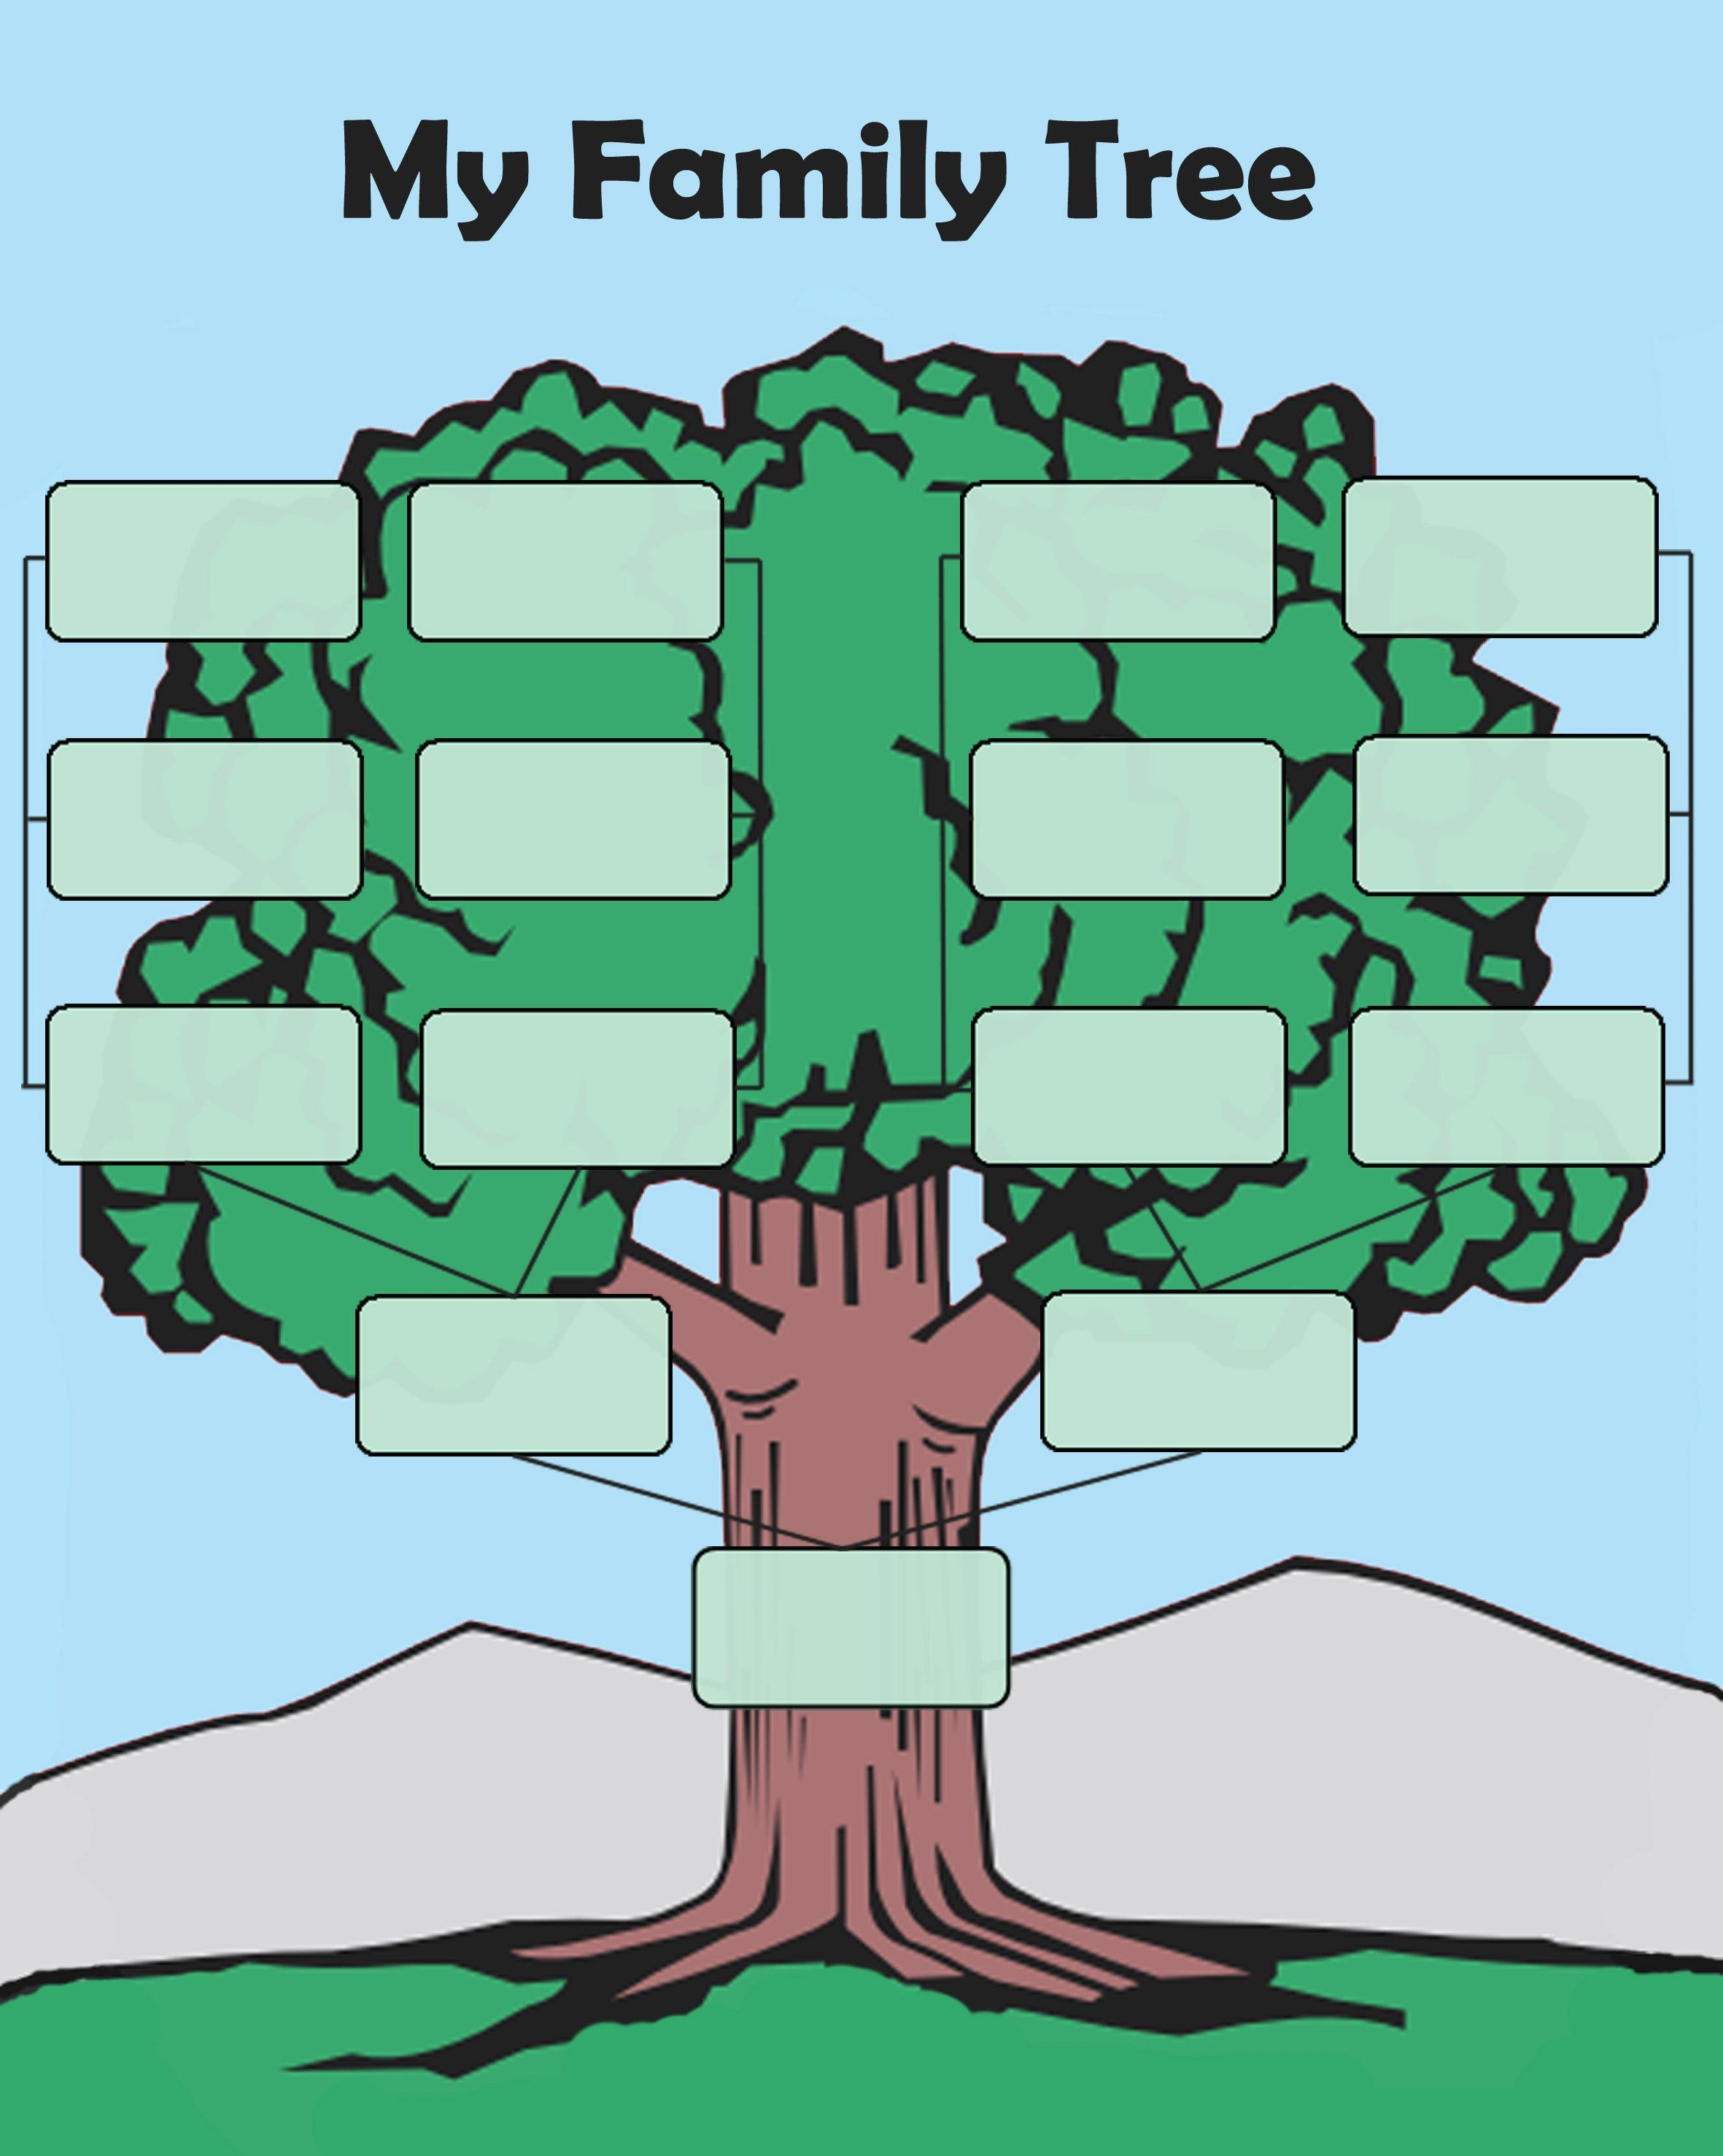 Family Tree Template Free Luxury Free Editable Family Tree Template Daily Roabox